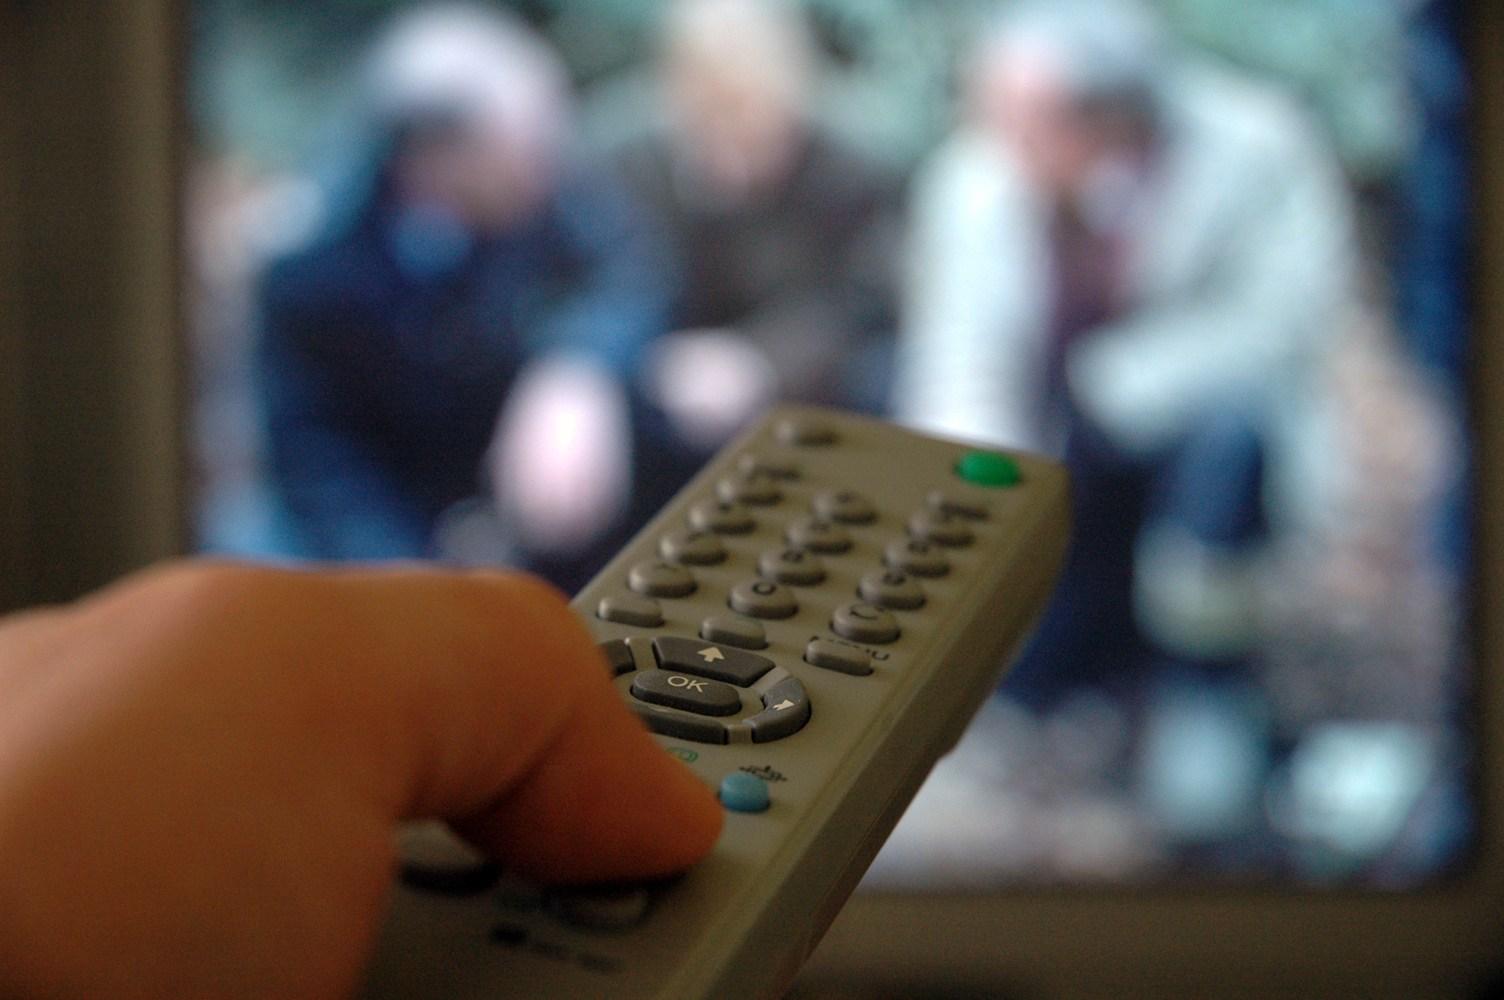 [tv] Lundi 3 juin 2013 : A la télévision ce soir